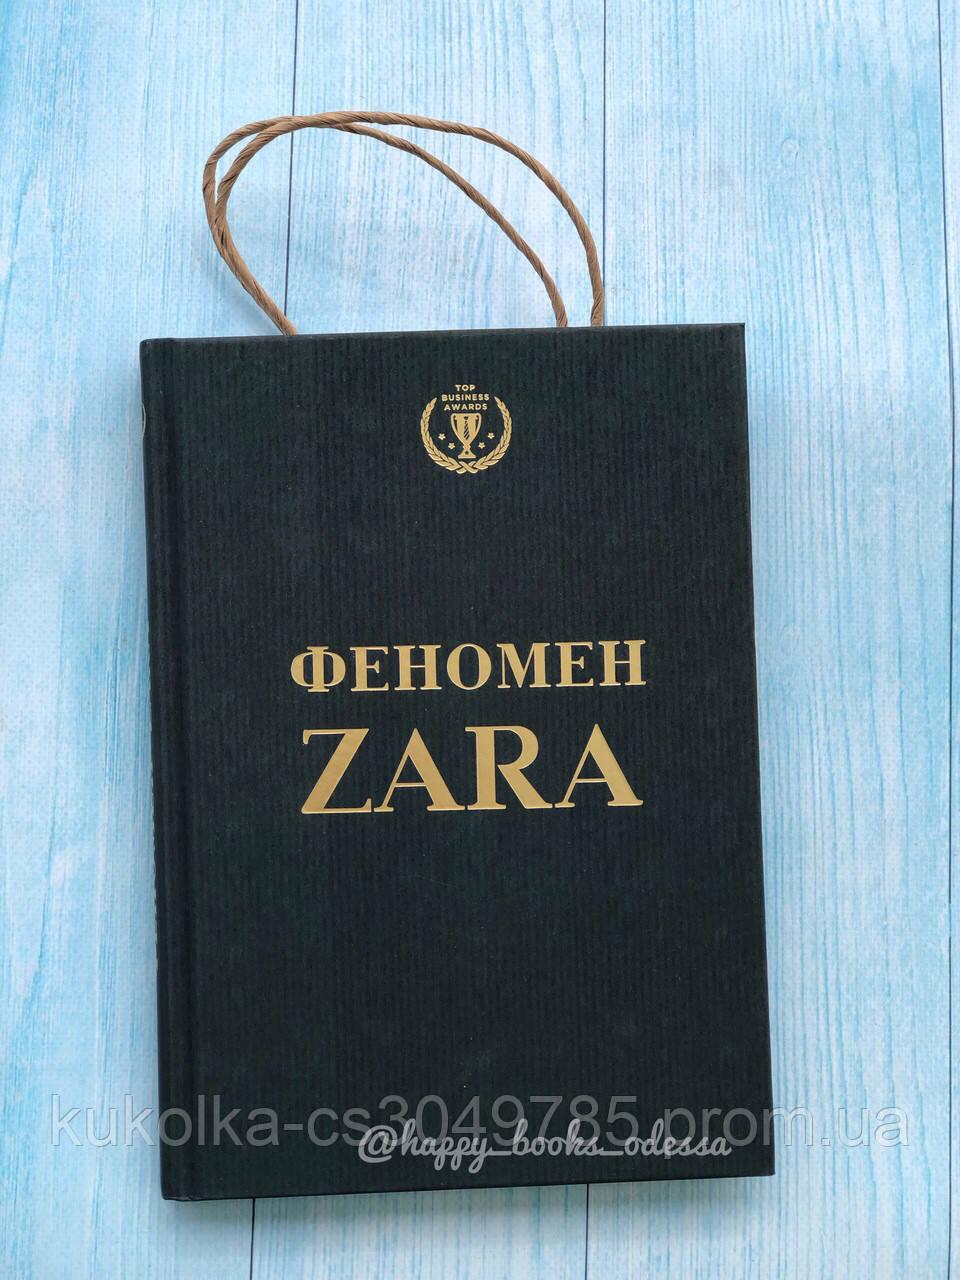 Феномен Zara ( укр язык )